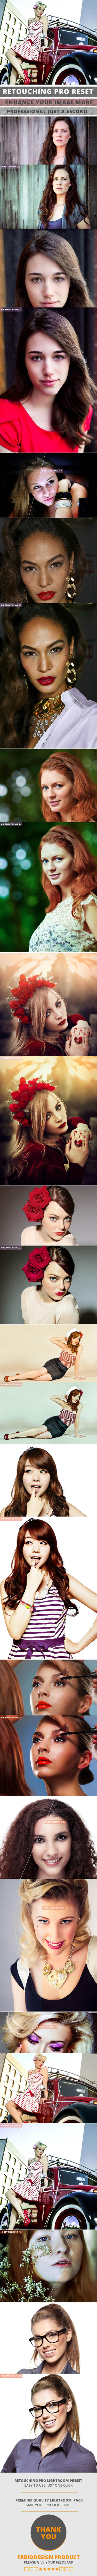 Retouching Pro Preset - Portrait Lightroom Presets